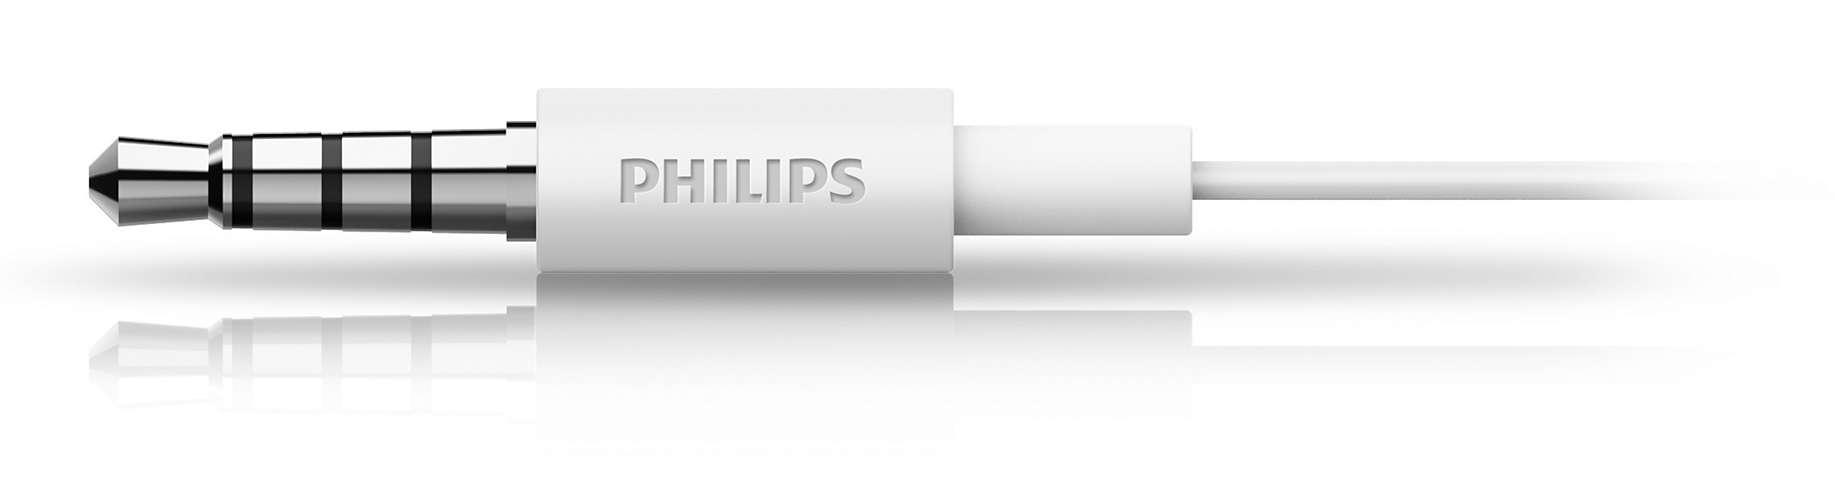 Fone De Ouvido Com Microfone Philips She1405wt 94 Branco Media Jgos17 In Ear Headphone With Mic She1405 Black